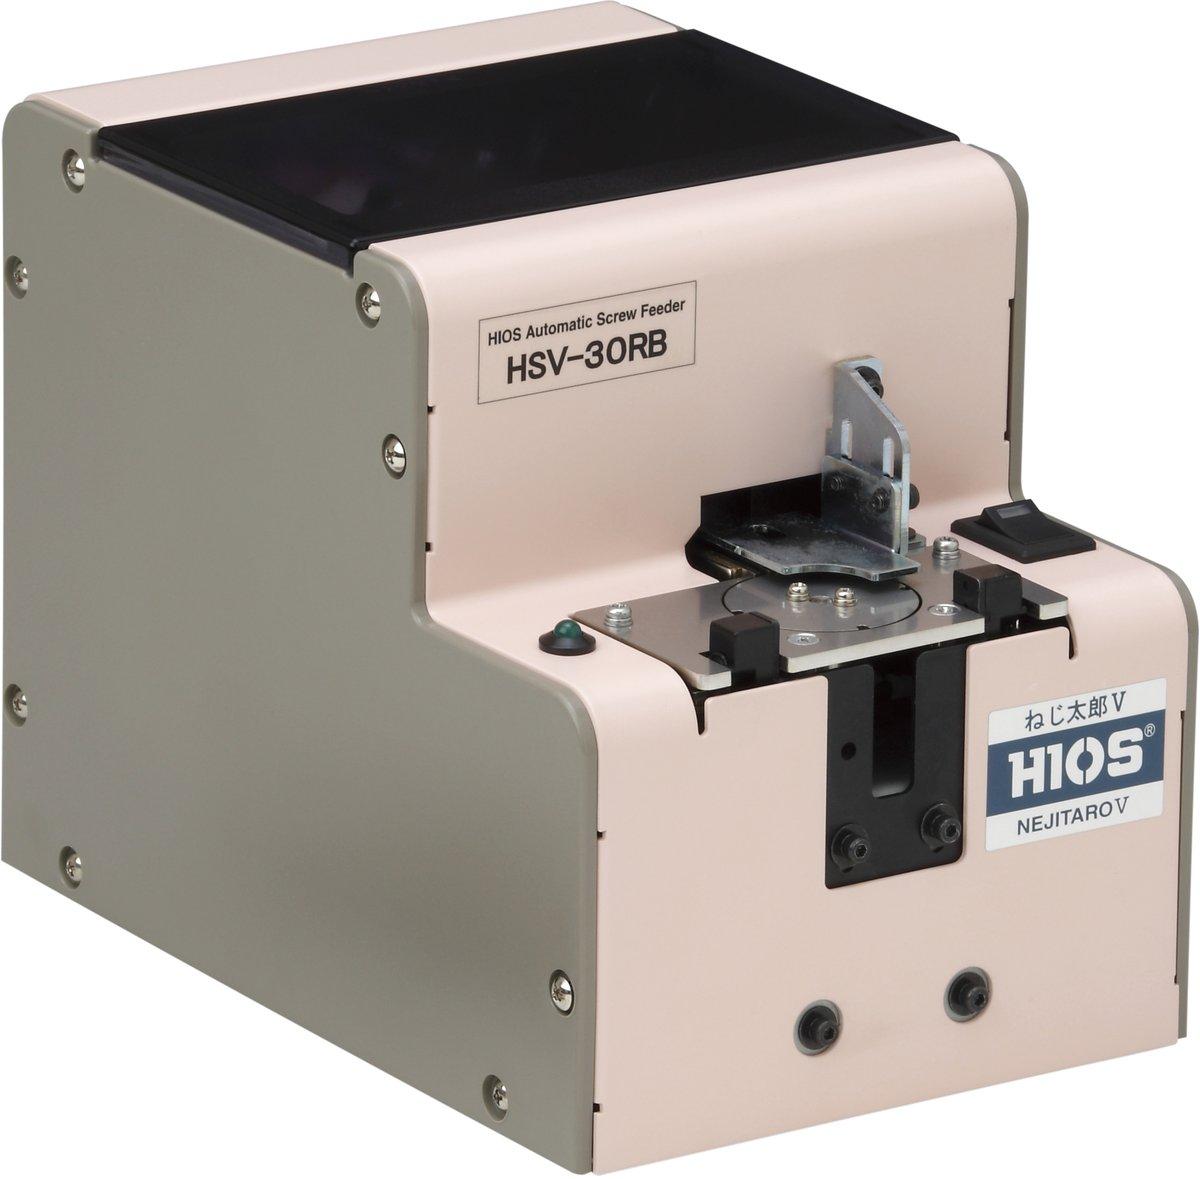 iv product accurate feeder modmc other model mechatron schenck screw